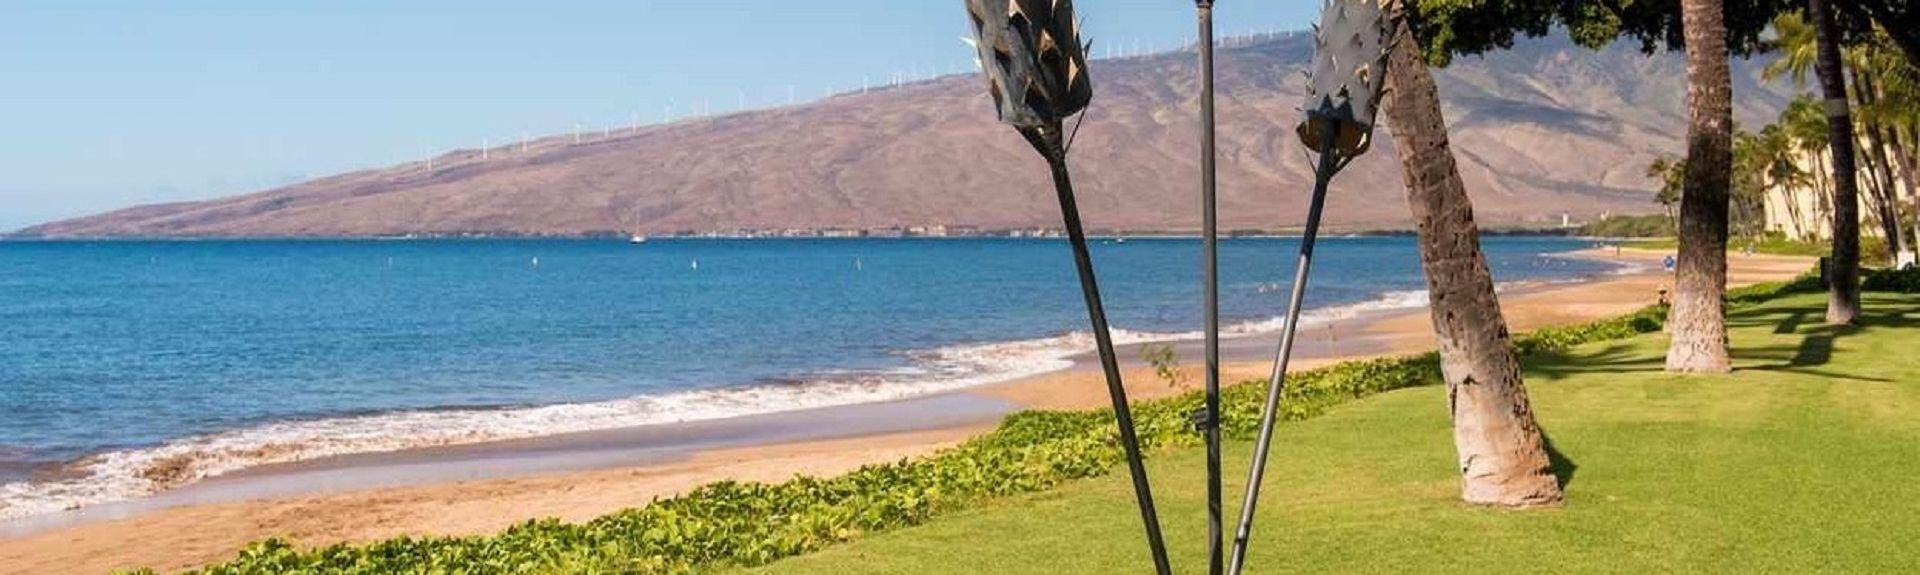 Maalaea Surf (Kihei, Hawaï, États-Unis d'Amérique)